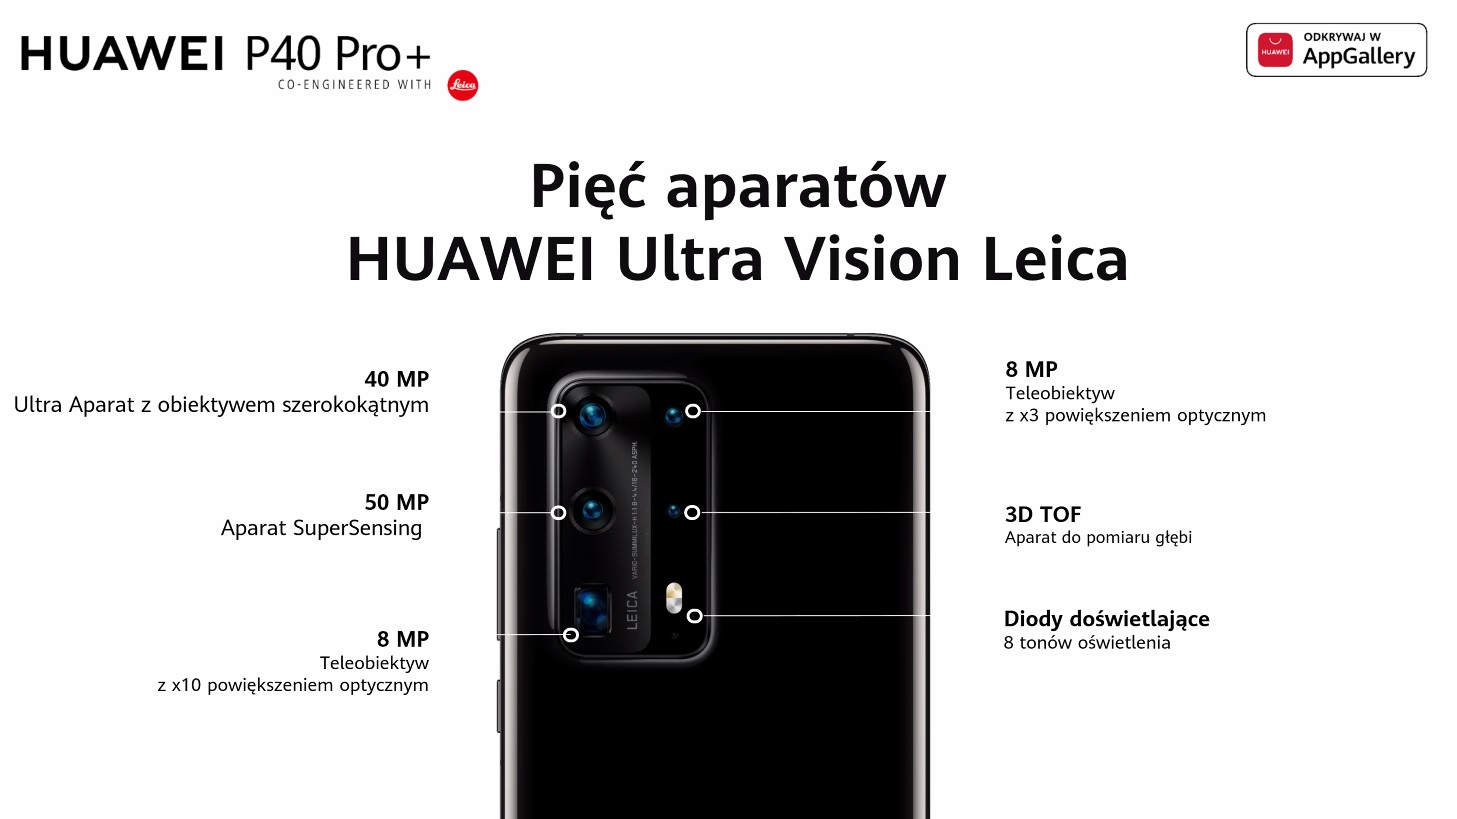 Huawei P40 Pro smartphone camera